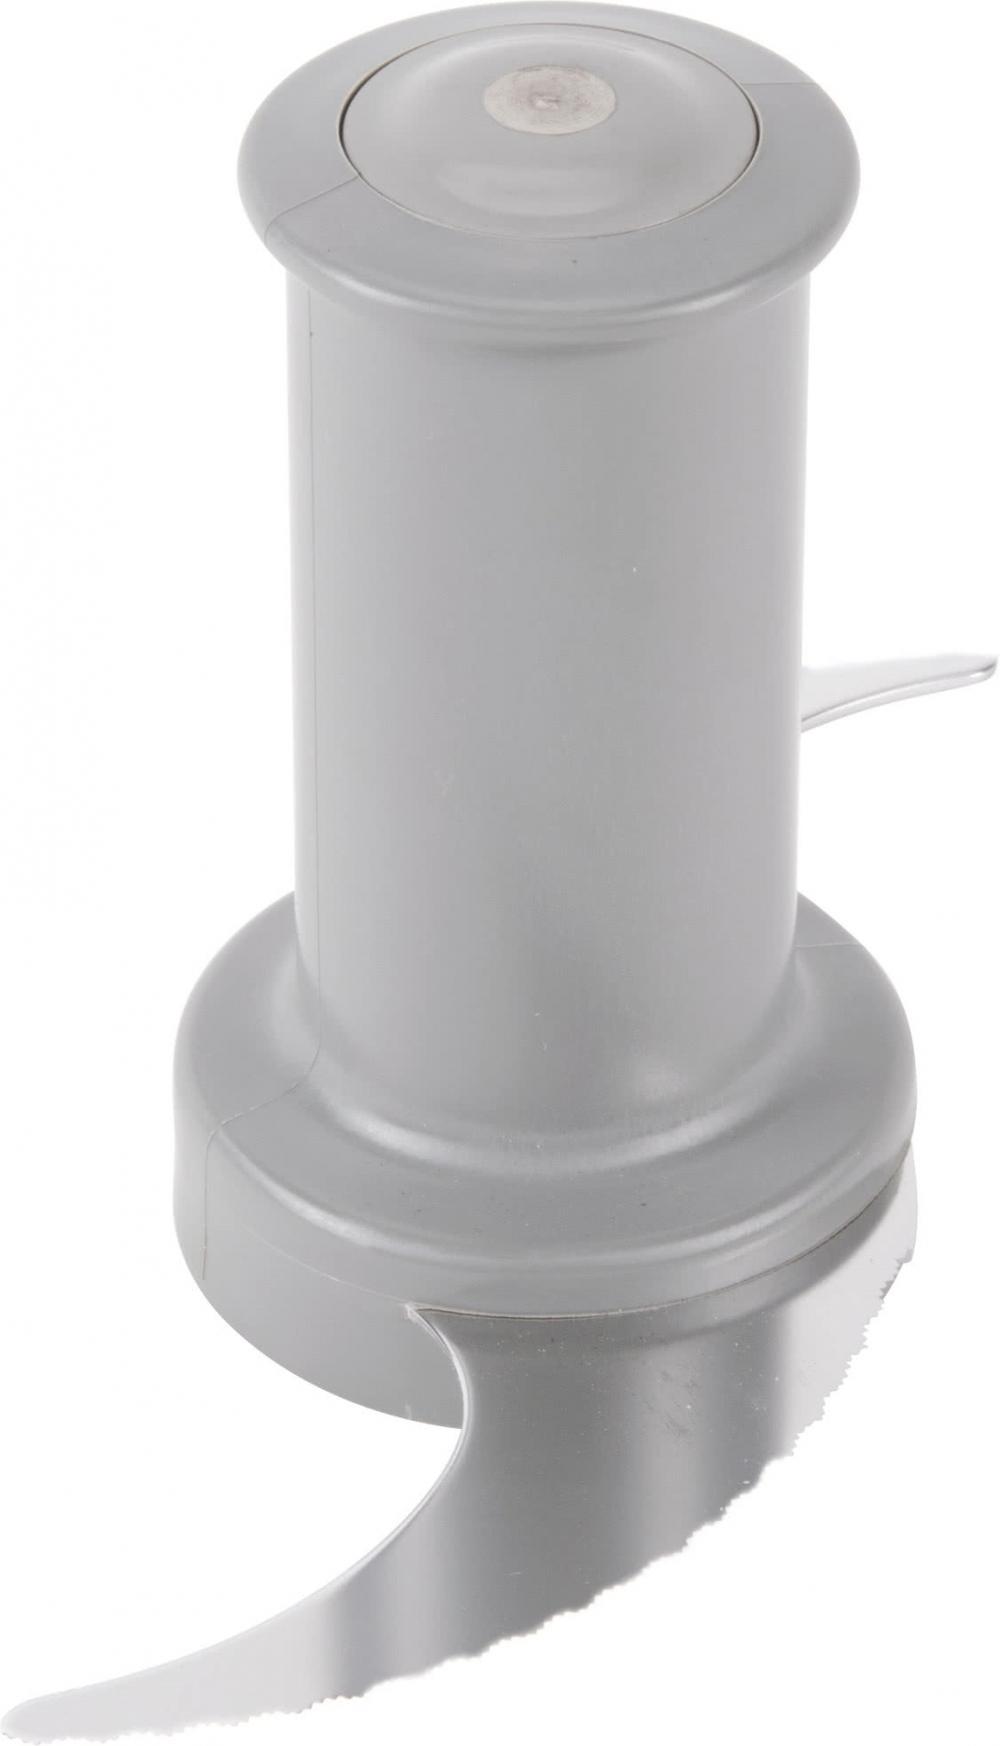 Зазубренный нож Robot Coupe 27370 - 2